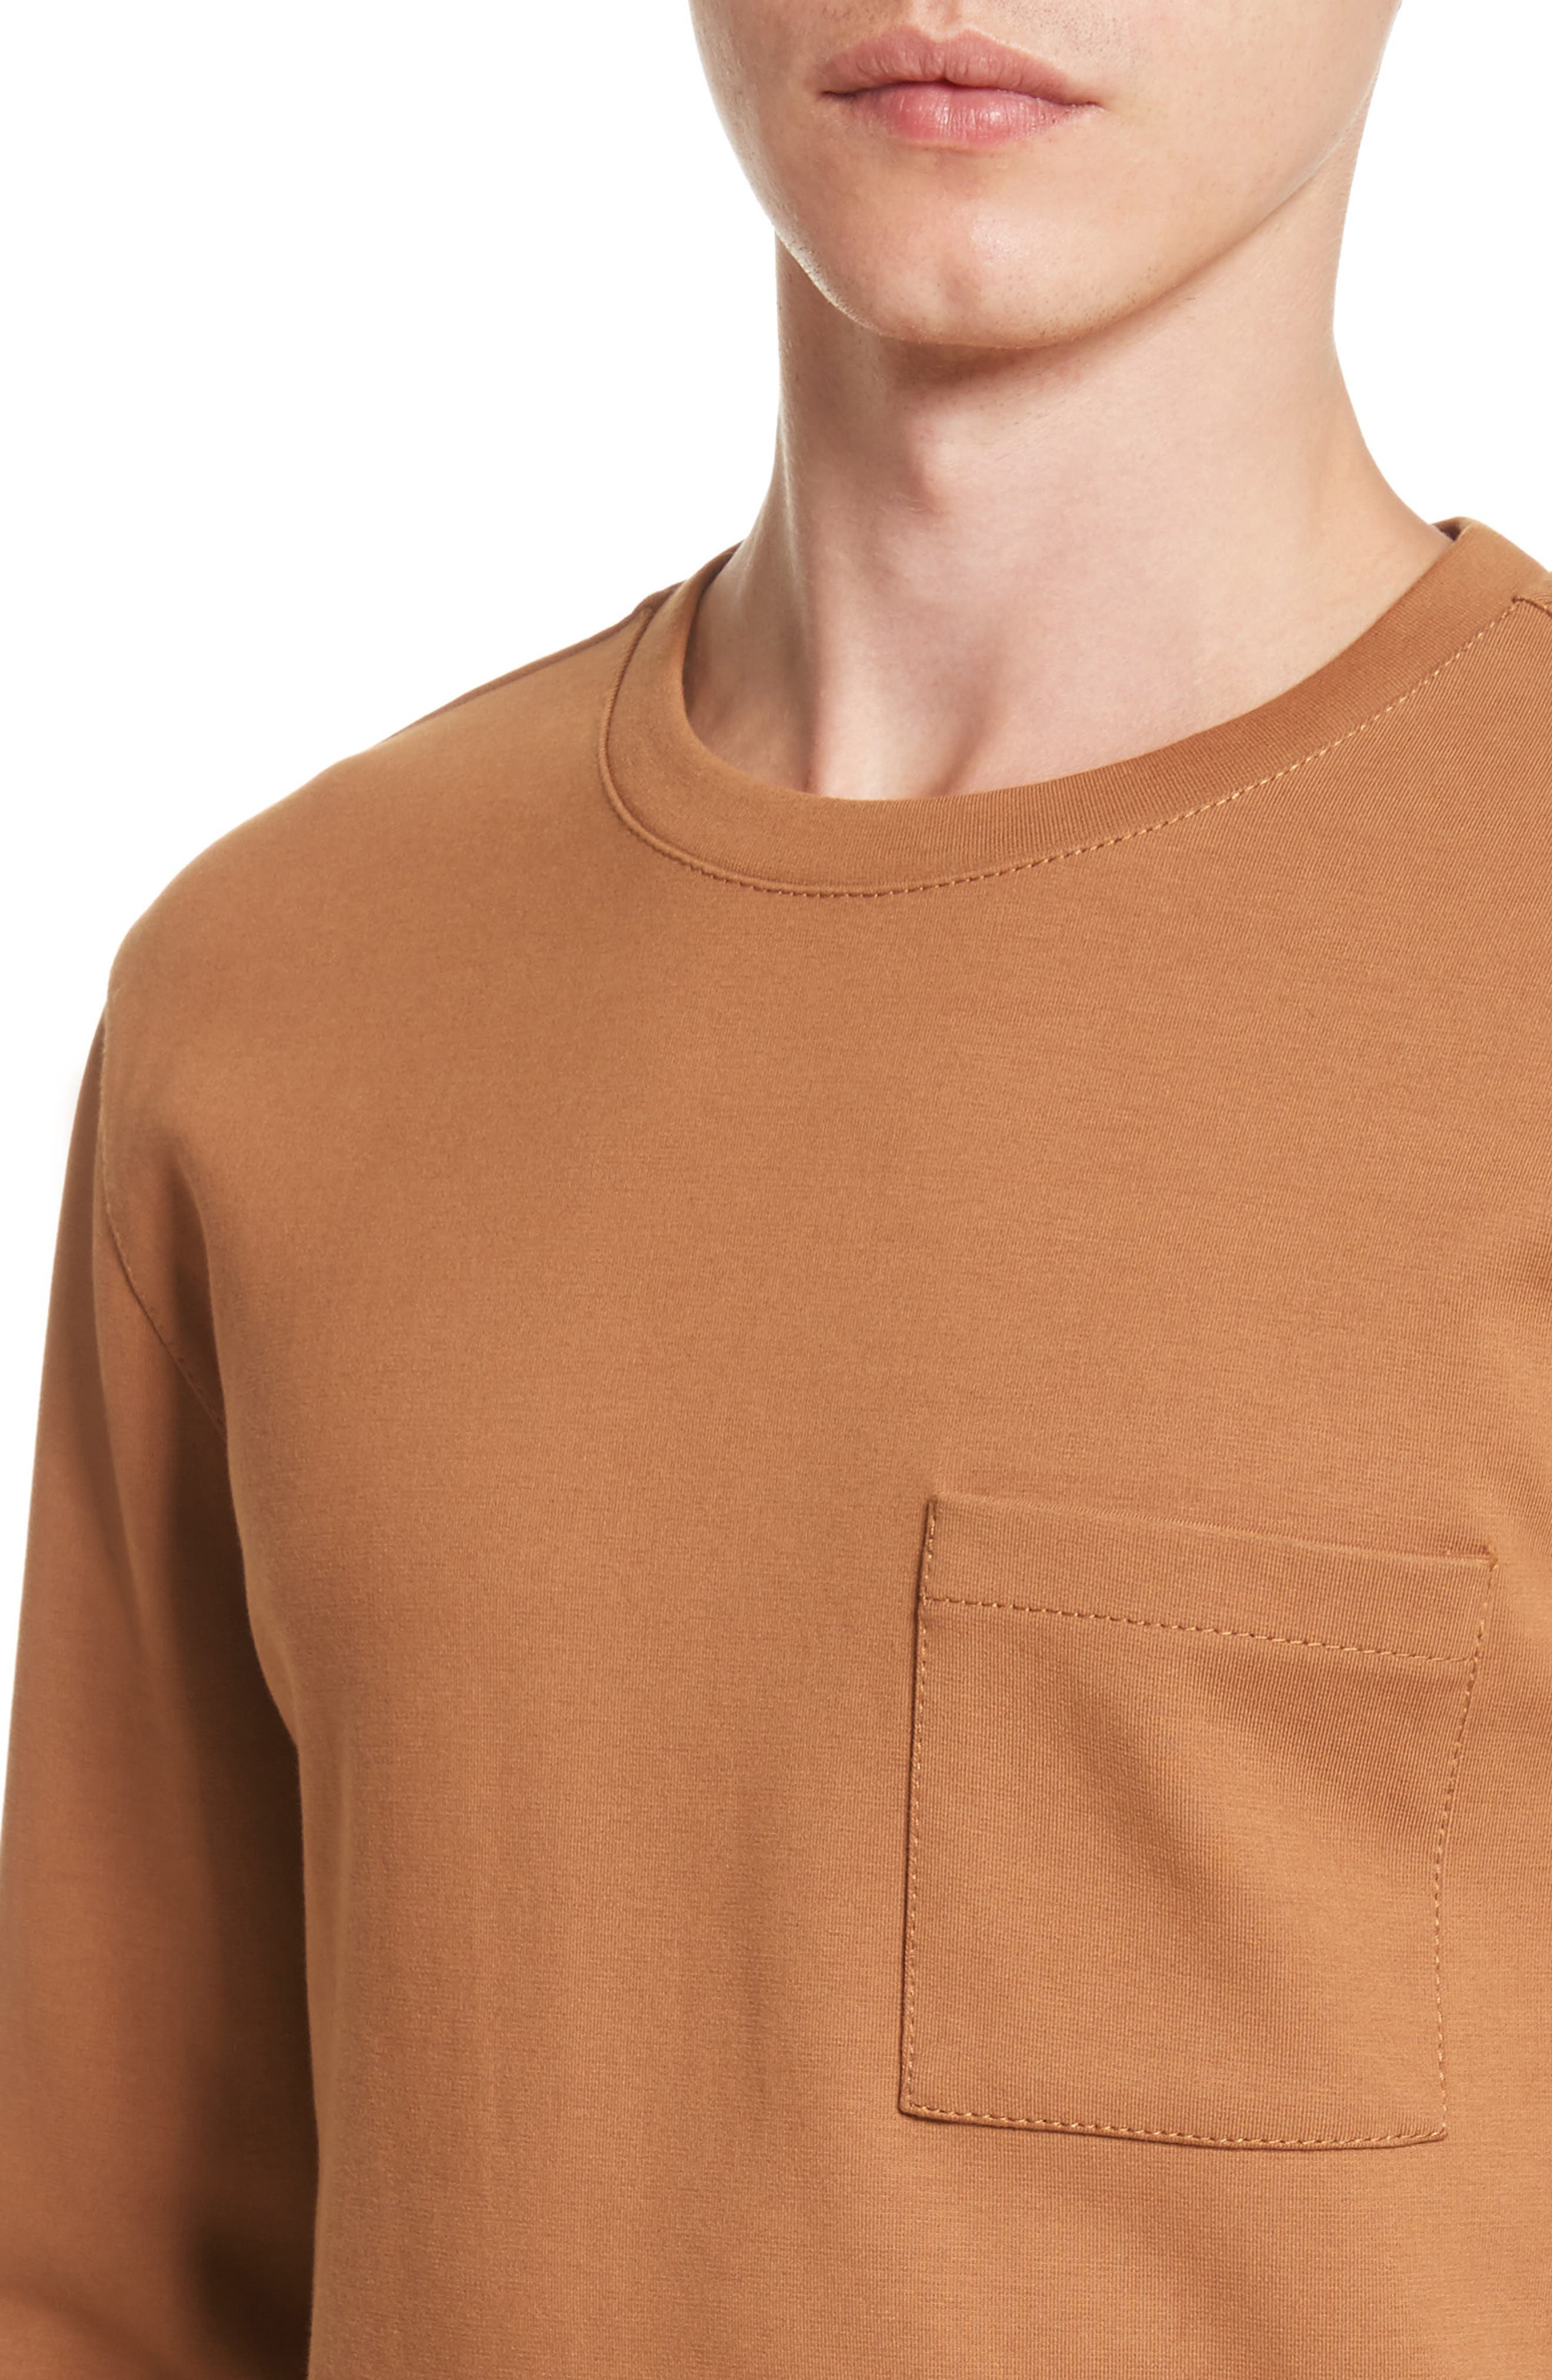 Yogi Sweatshirt,                             Alternate thumbnail 4, color,                             243